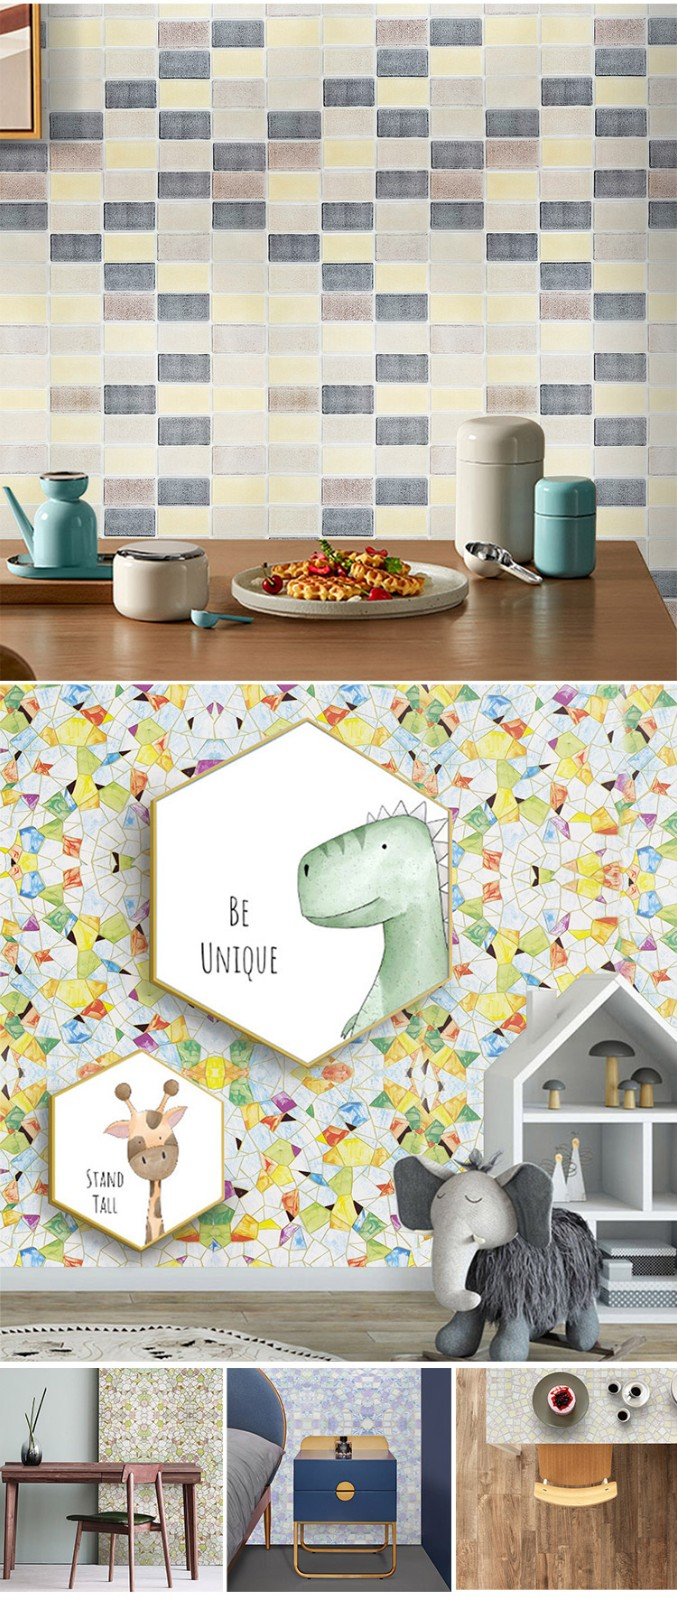 SUNYE PVC PRINTED SERIES ADHESIVE FILM manufacturer for living room-6